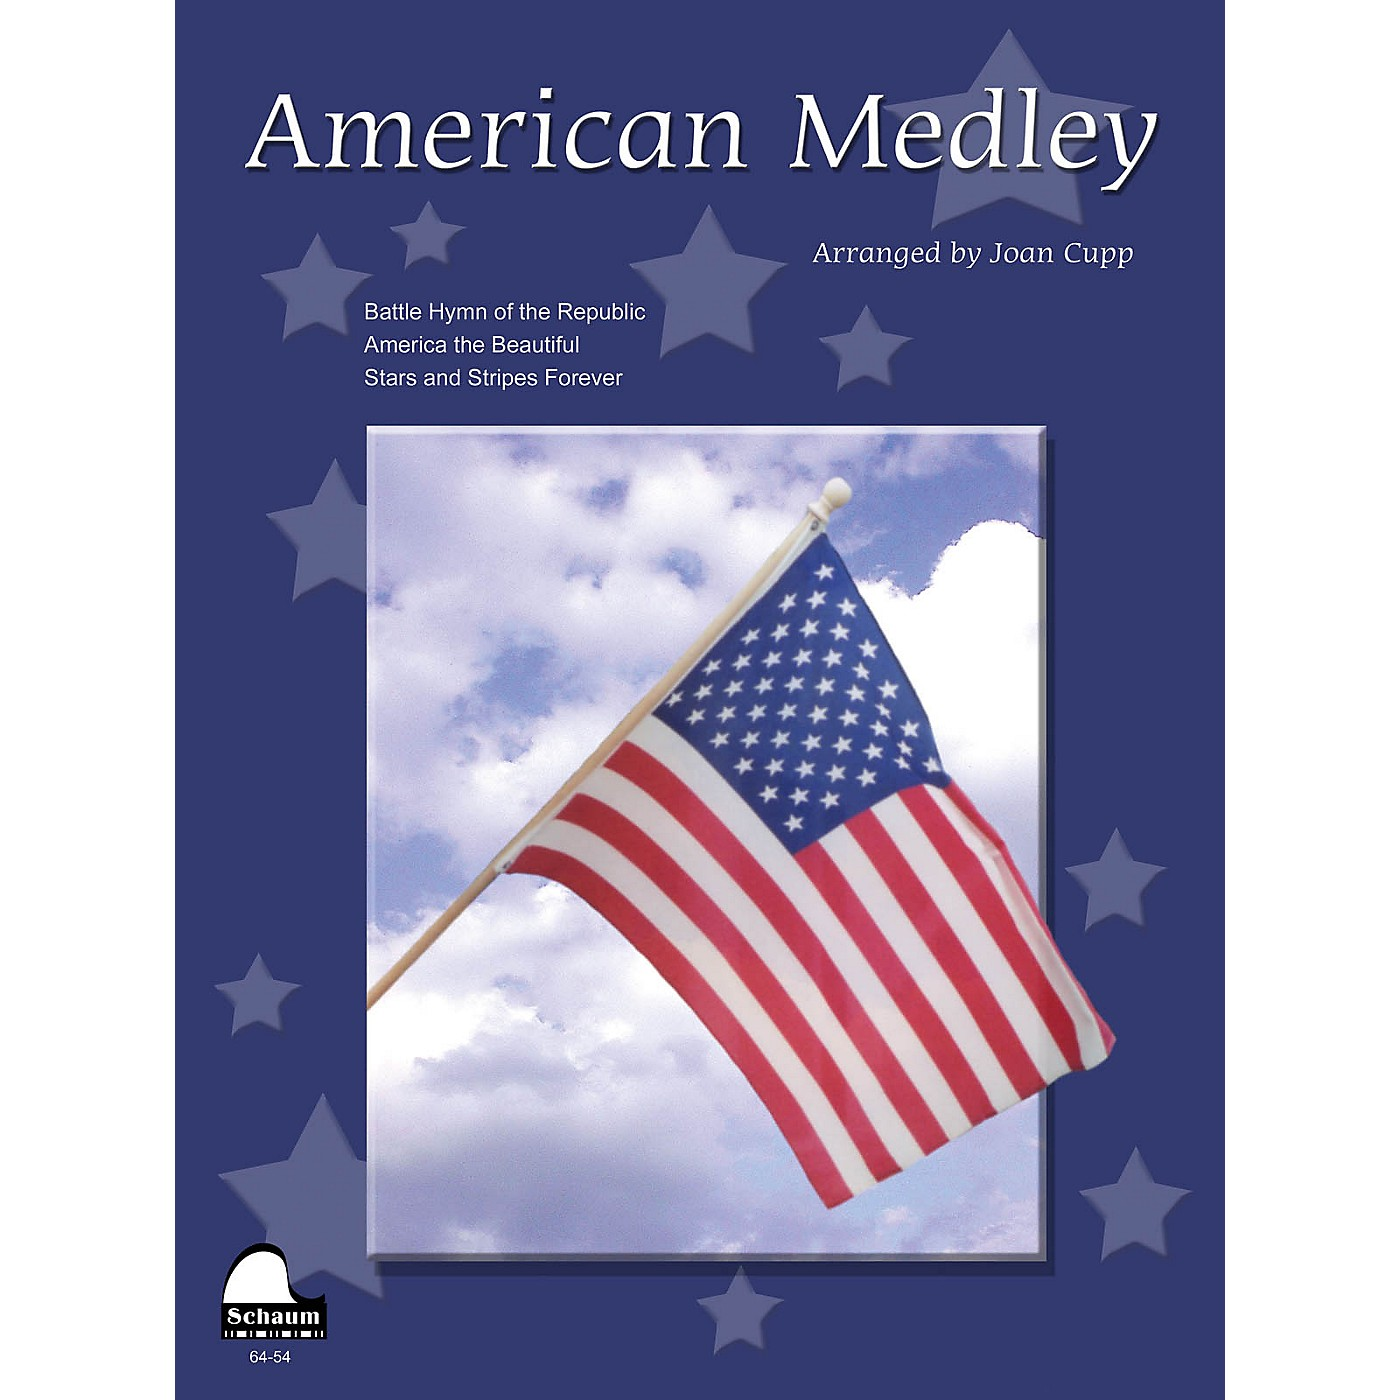 SCHAUM American Medley (NFMC 2016-2020 Federation Festivals Bulletin) Educational Piano Book (Level Upper Int) thumbnail